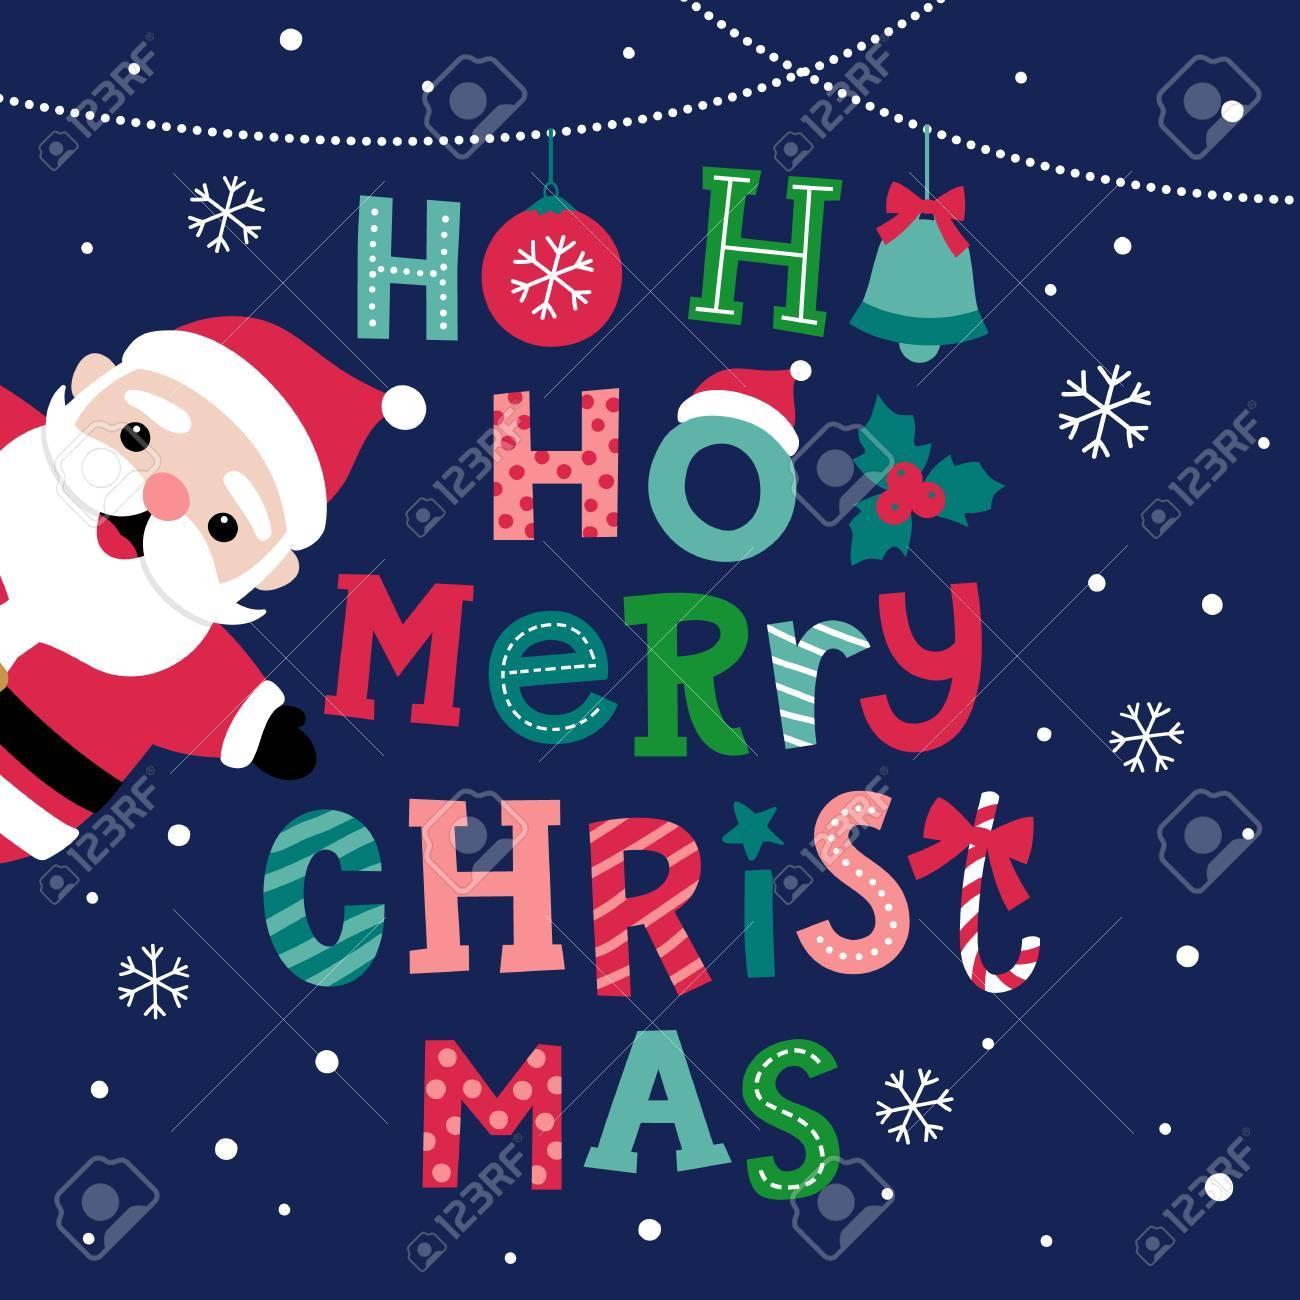 Ho Ho Ho Merry Christmas.Ho Ho Ho Merry Christmas Lettering And Cartoon Santa Claus Typographic